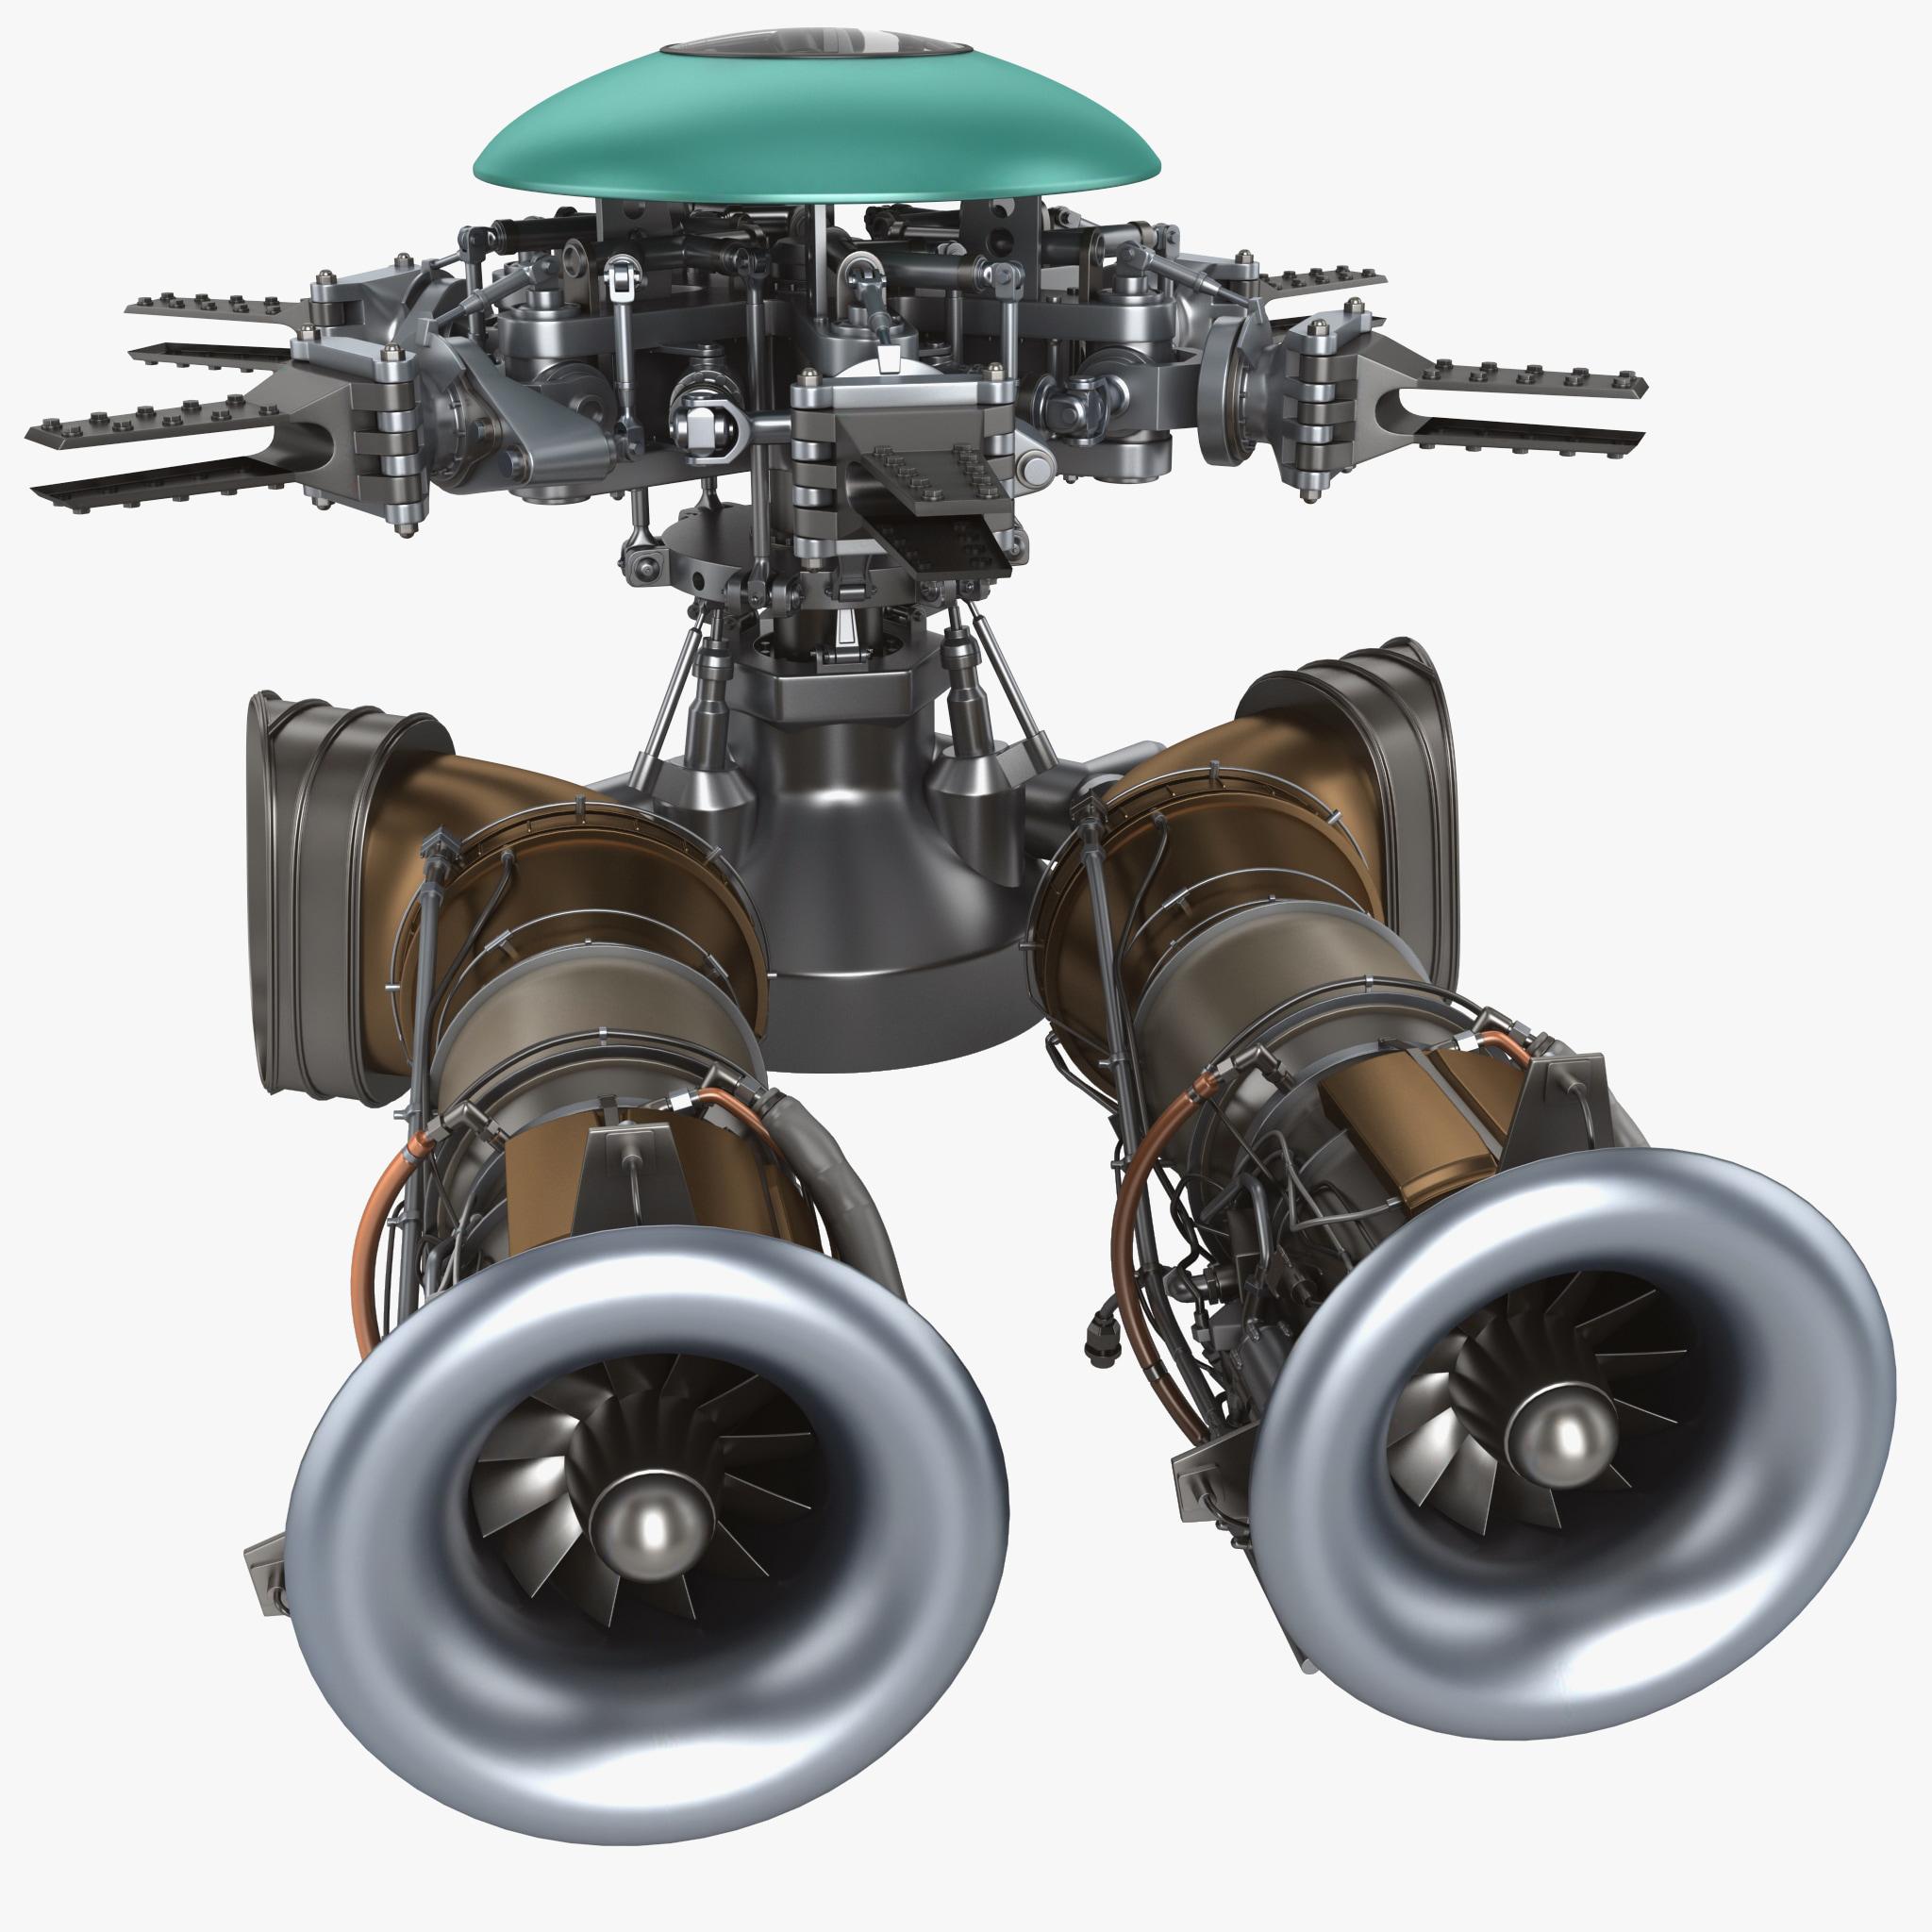 Helicopter Engine 4_1.jpg